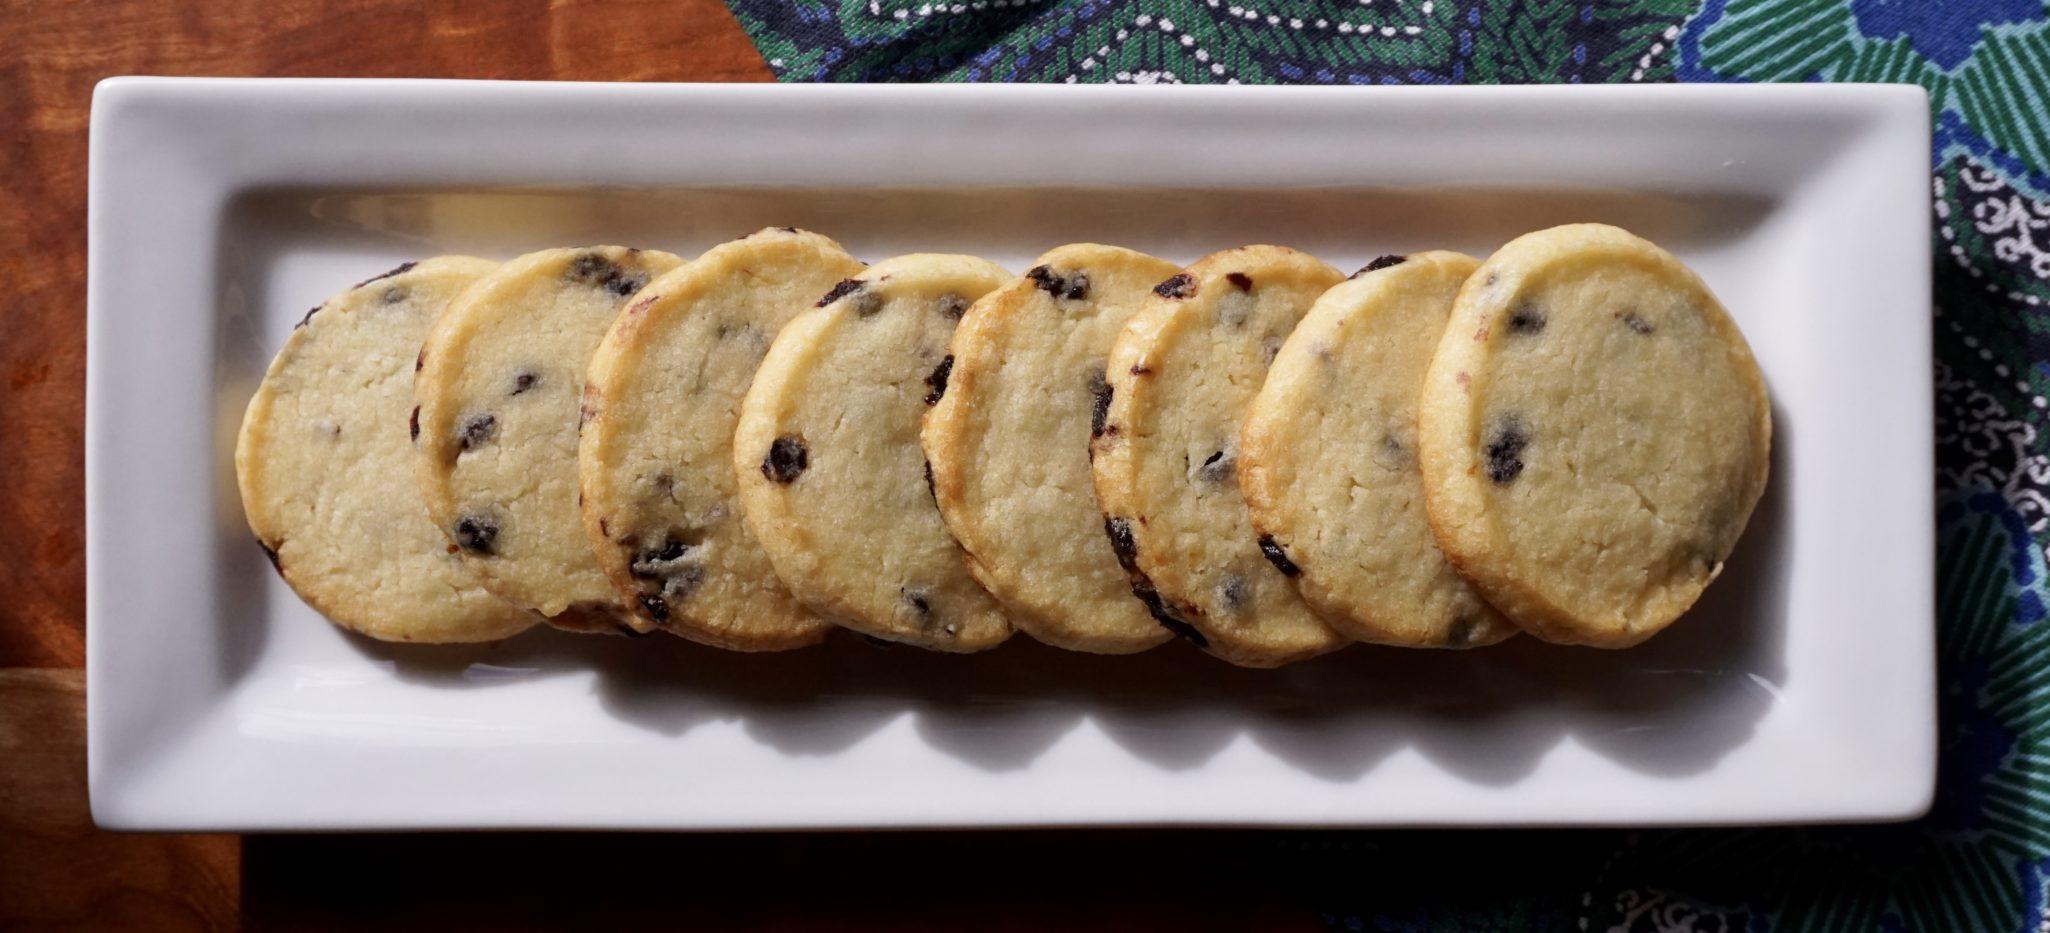 Lemon Cookie Very Pretty & The Cookie Is So Sweet (Blueberry-Lemon Shortbread)